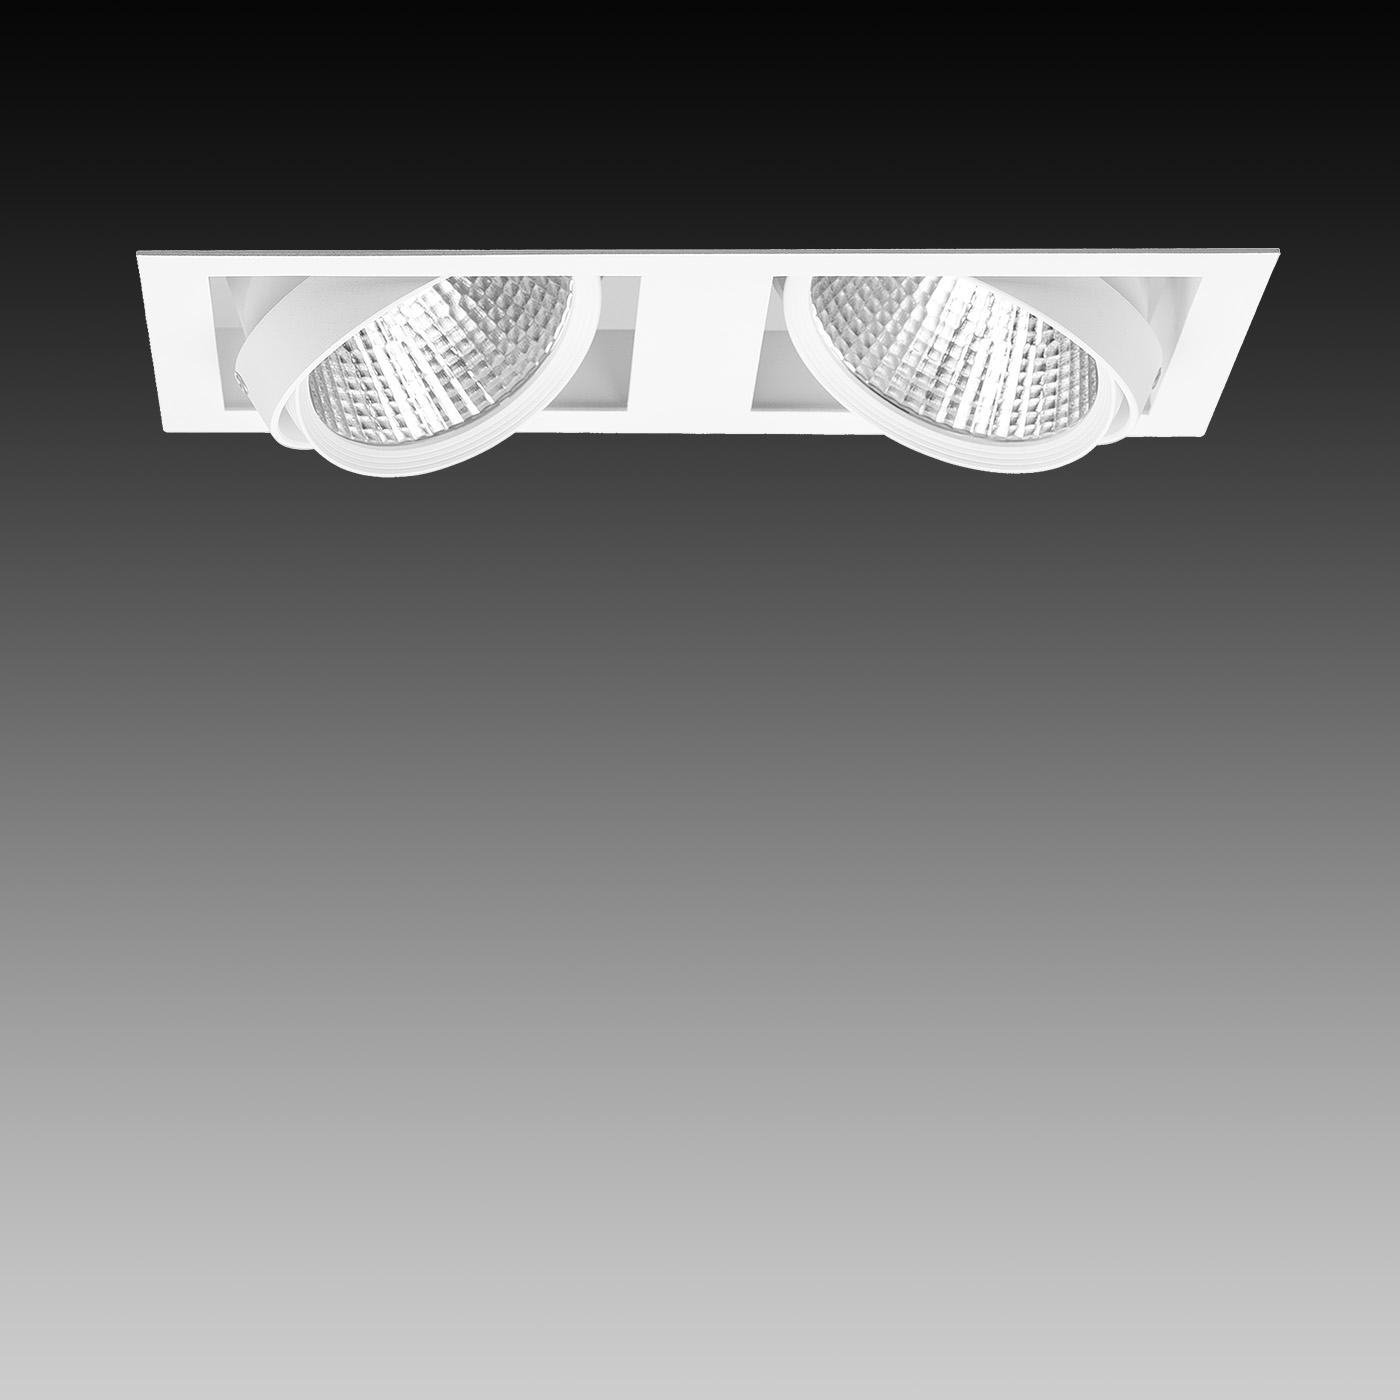 GRID | LAMP83 - Effiziente Beleuchtungssysteme